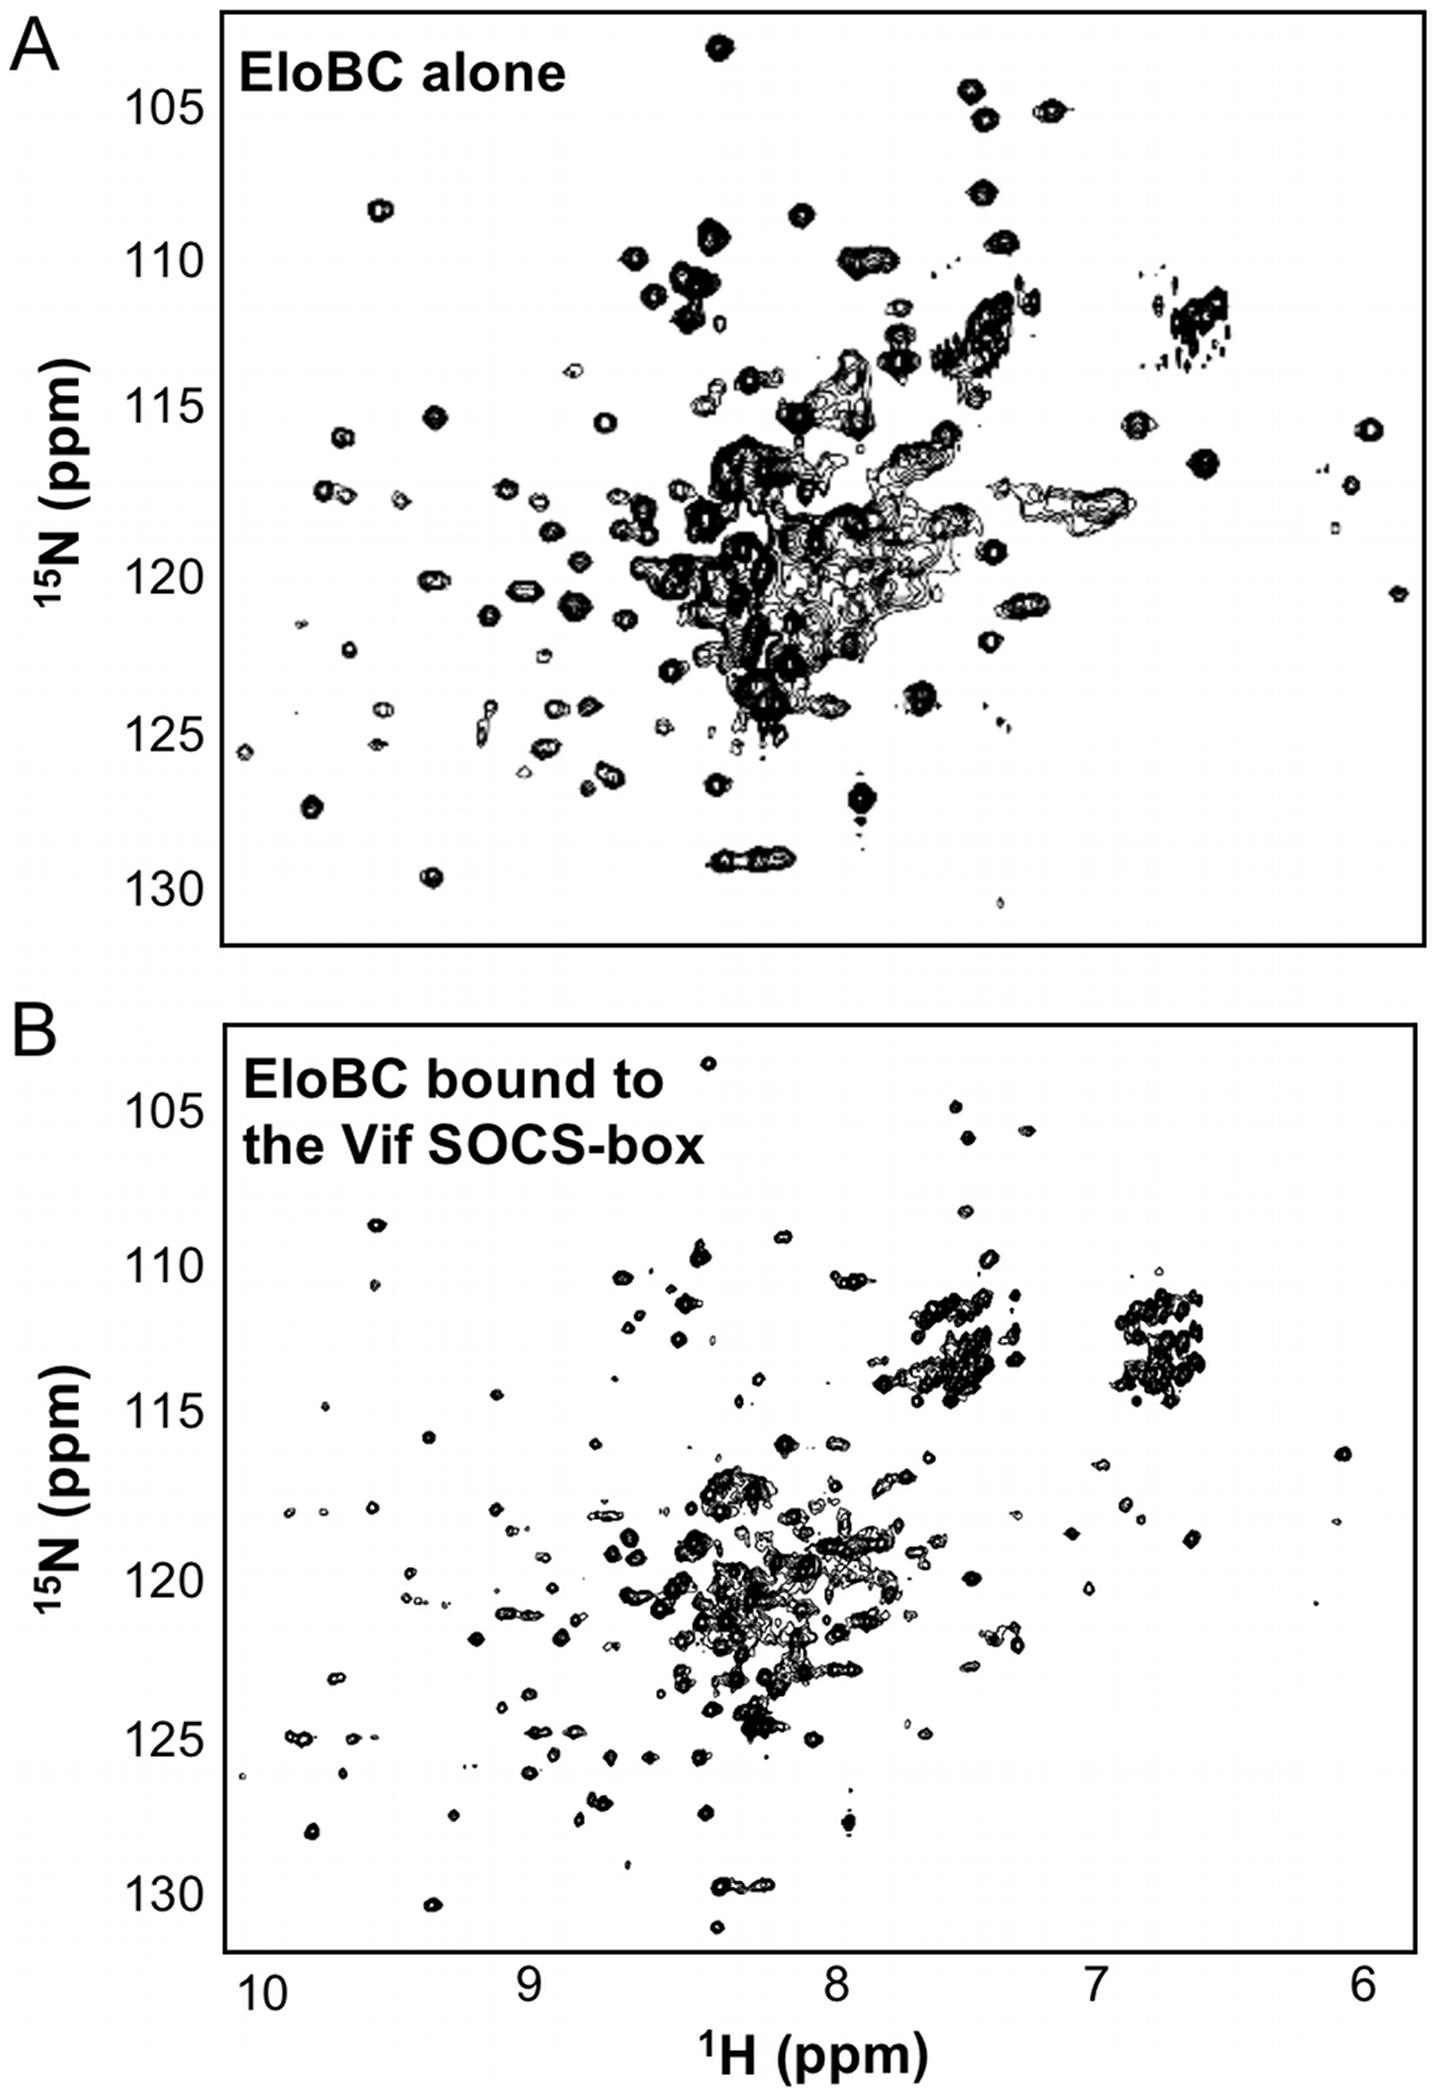 NMR spectroscopy of EloBC.